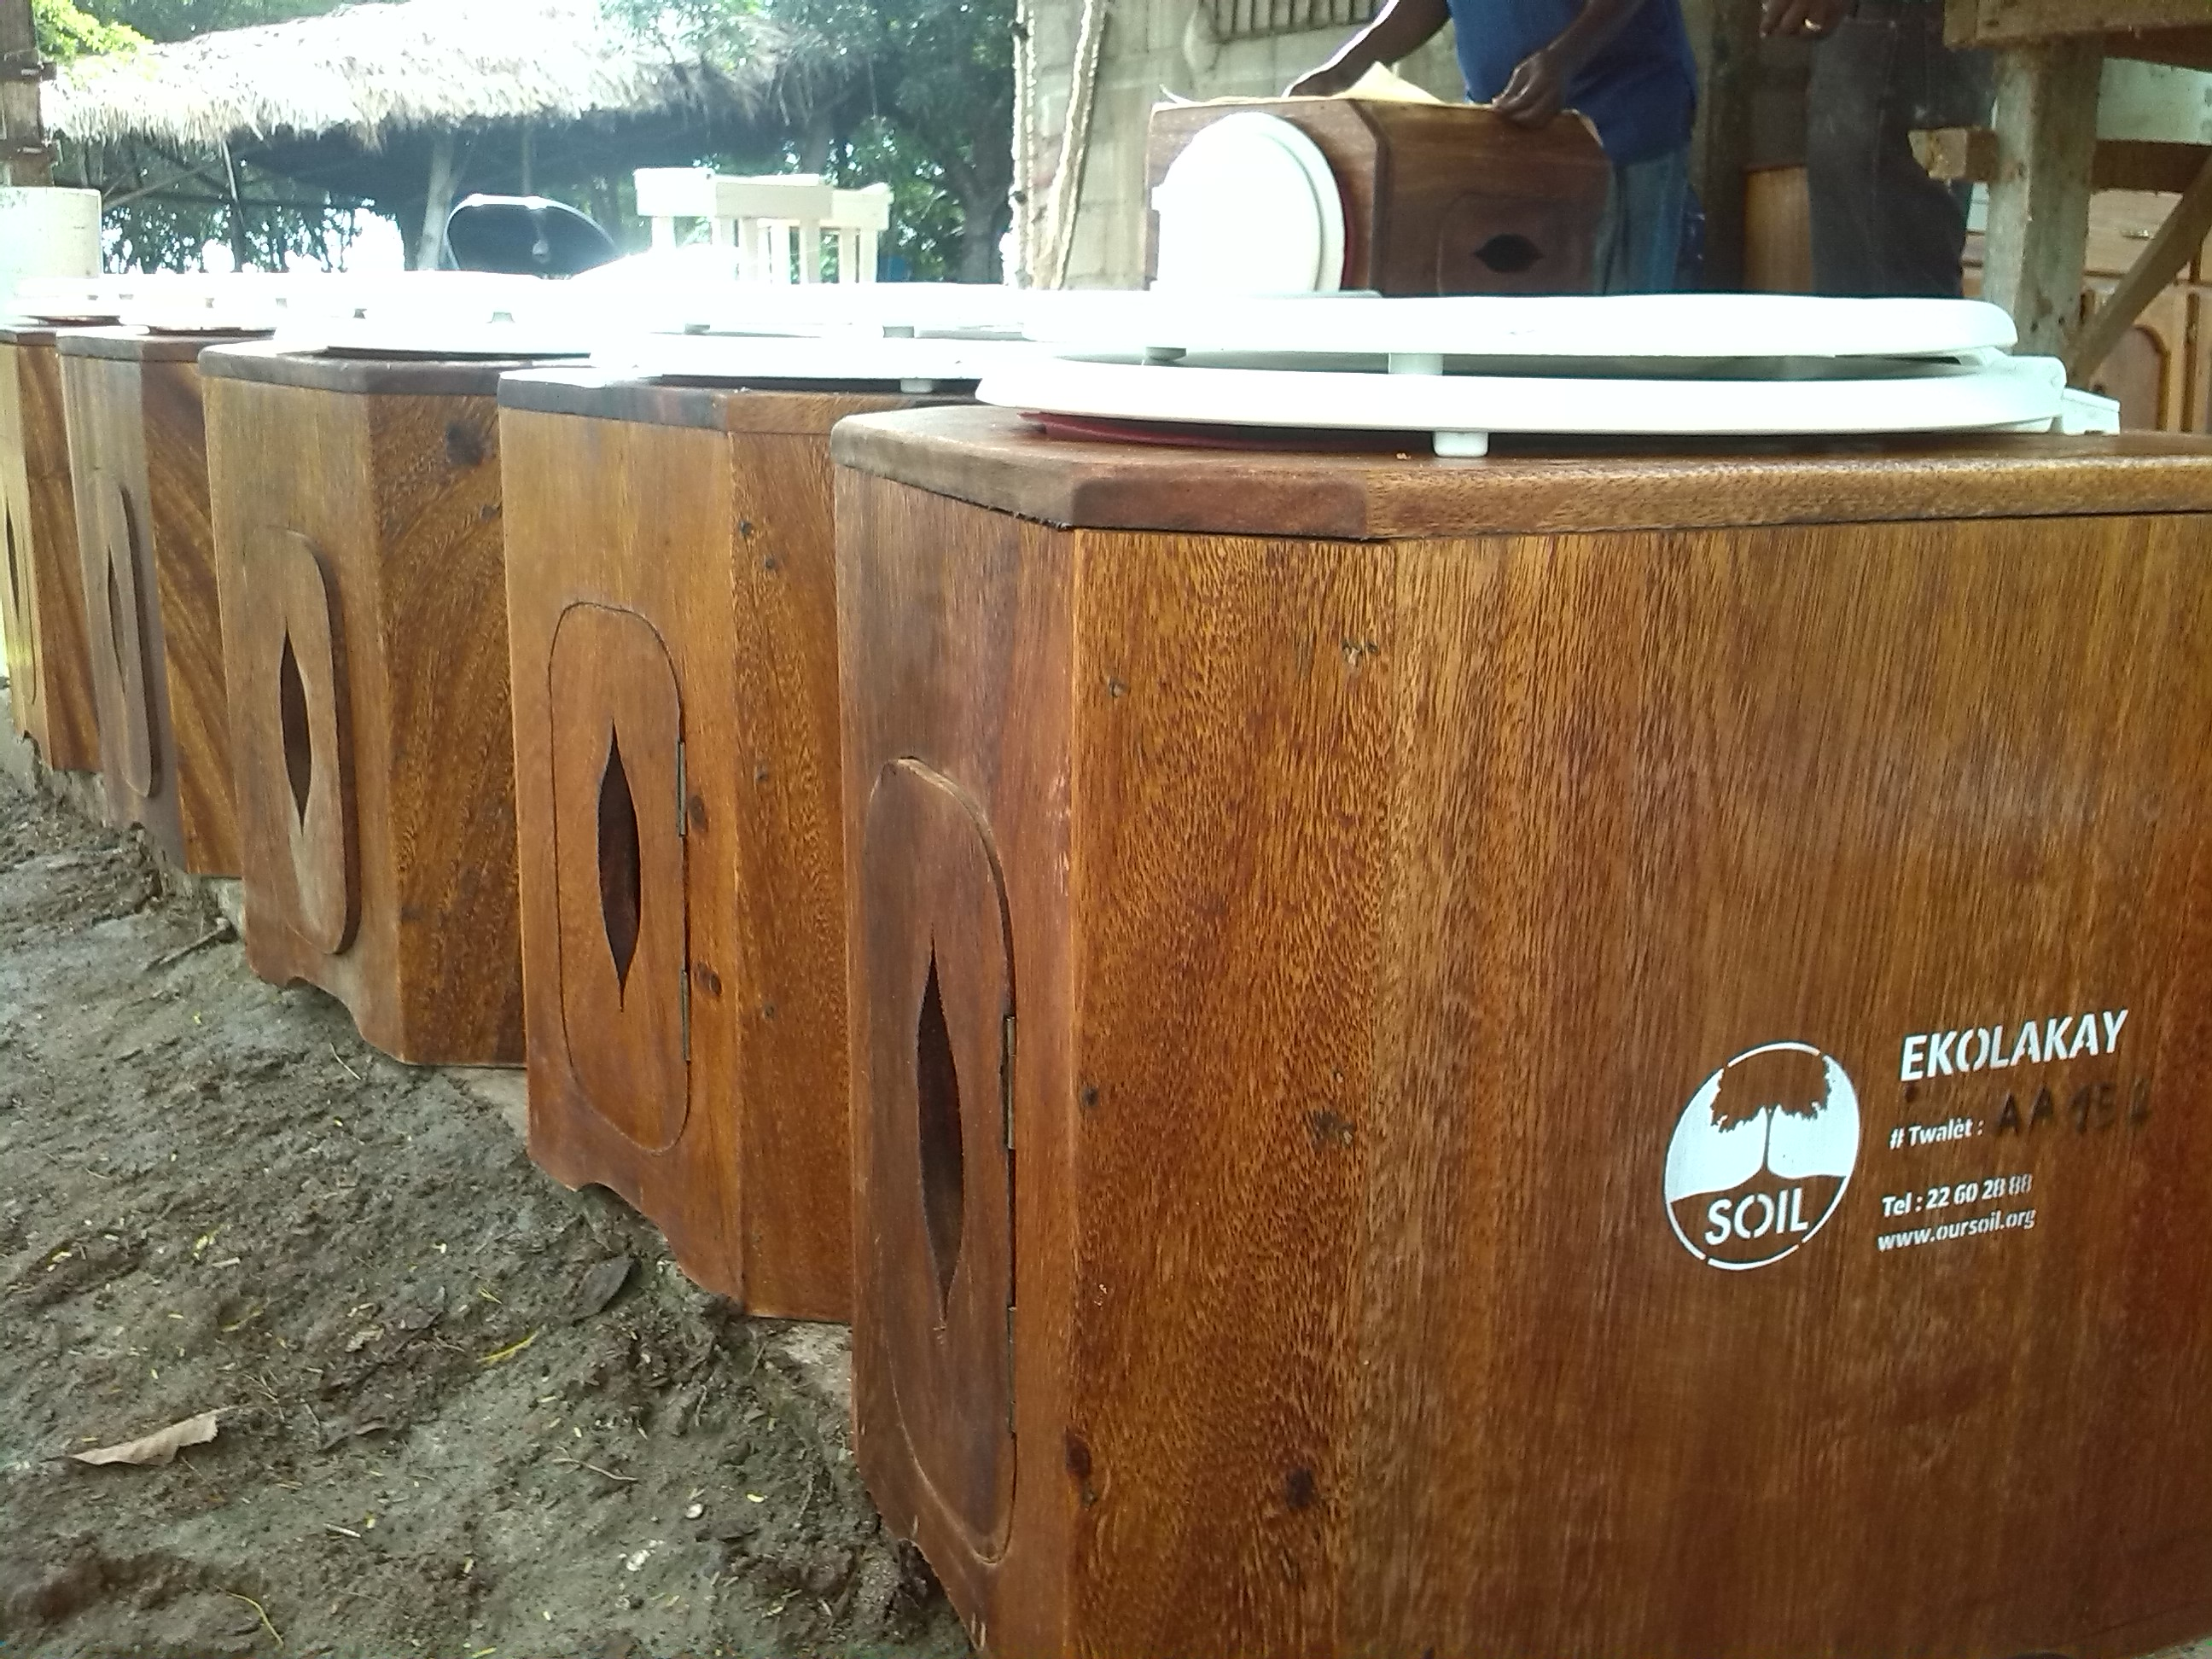 File:SOIL EkoLakay household EcoSan toilets, ready for installation ...